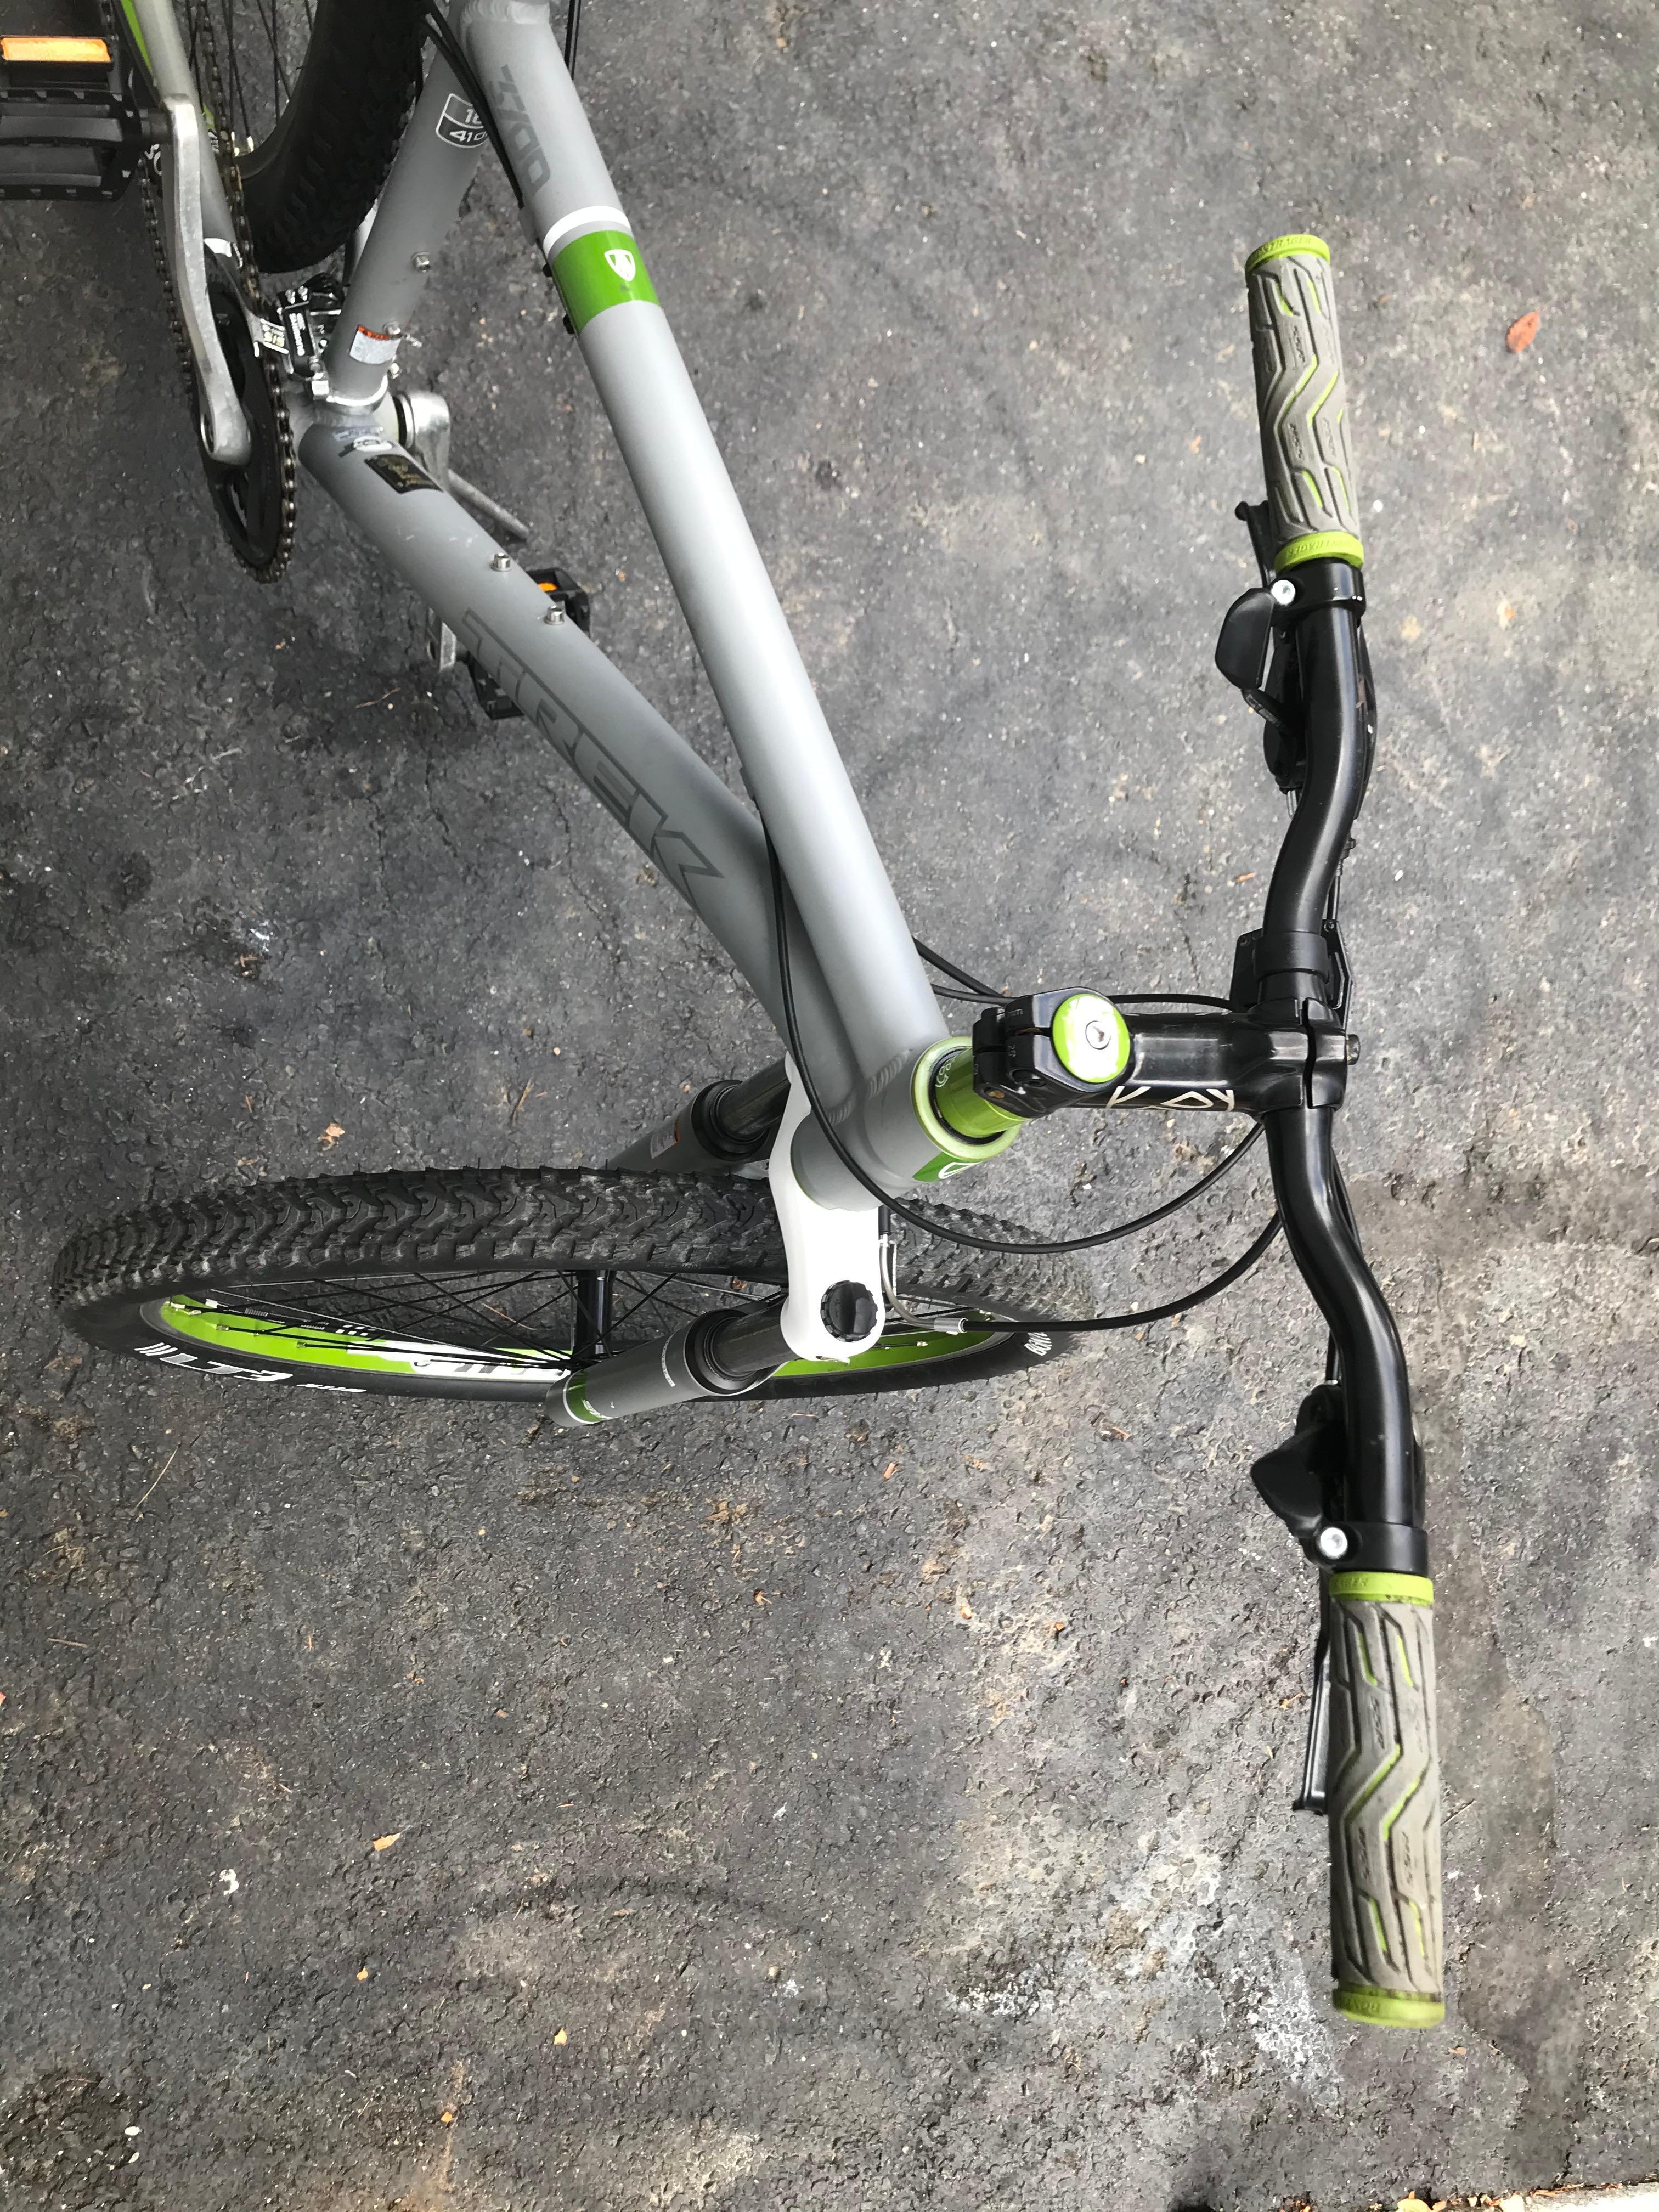 Trek 3700 Value : value, Deleted, 35551, BicycleBlueBook.com